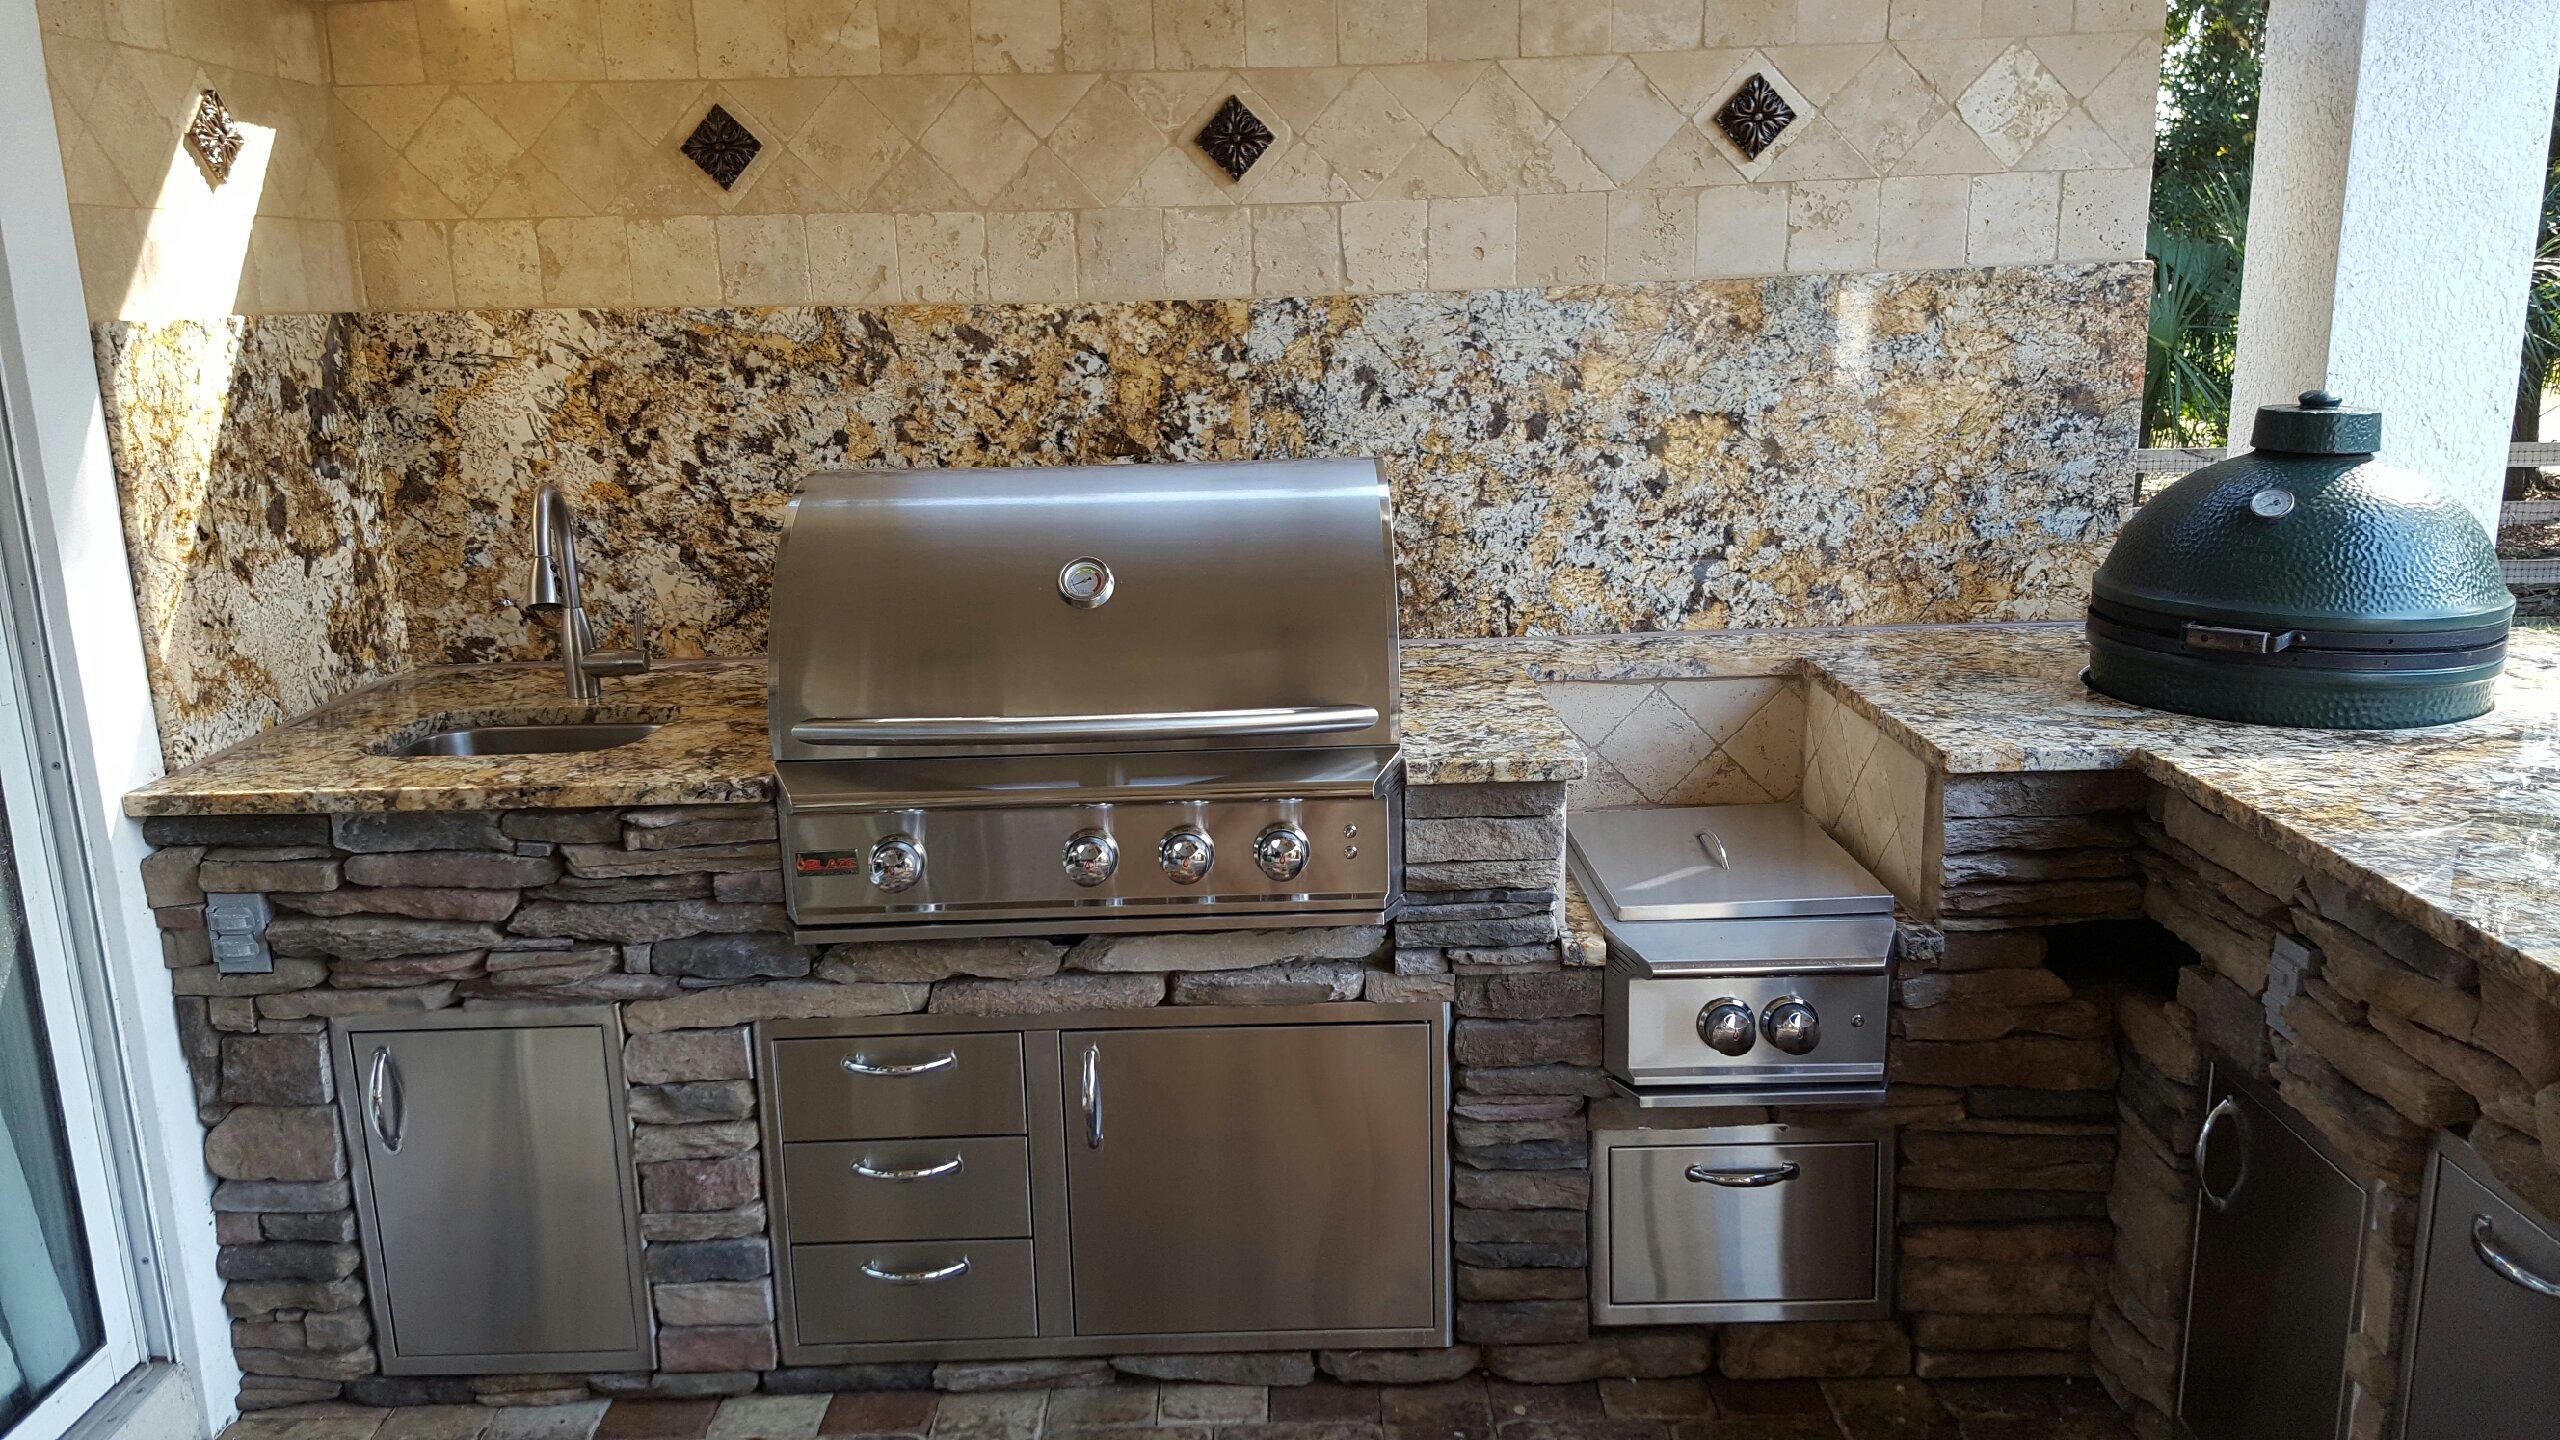 Creative Outdoor Kitchens Of Florida Big Green Egg Creative Outdoor Kitchens Of Florida